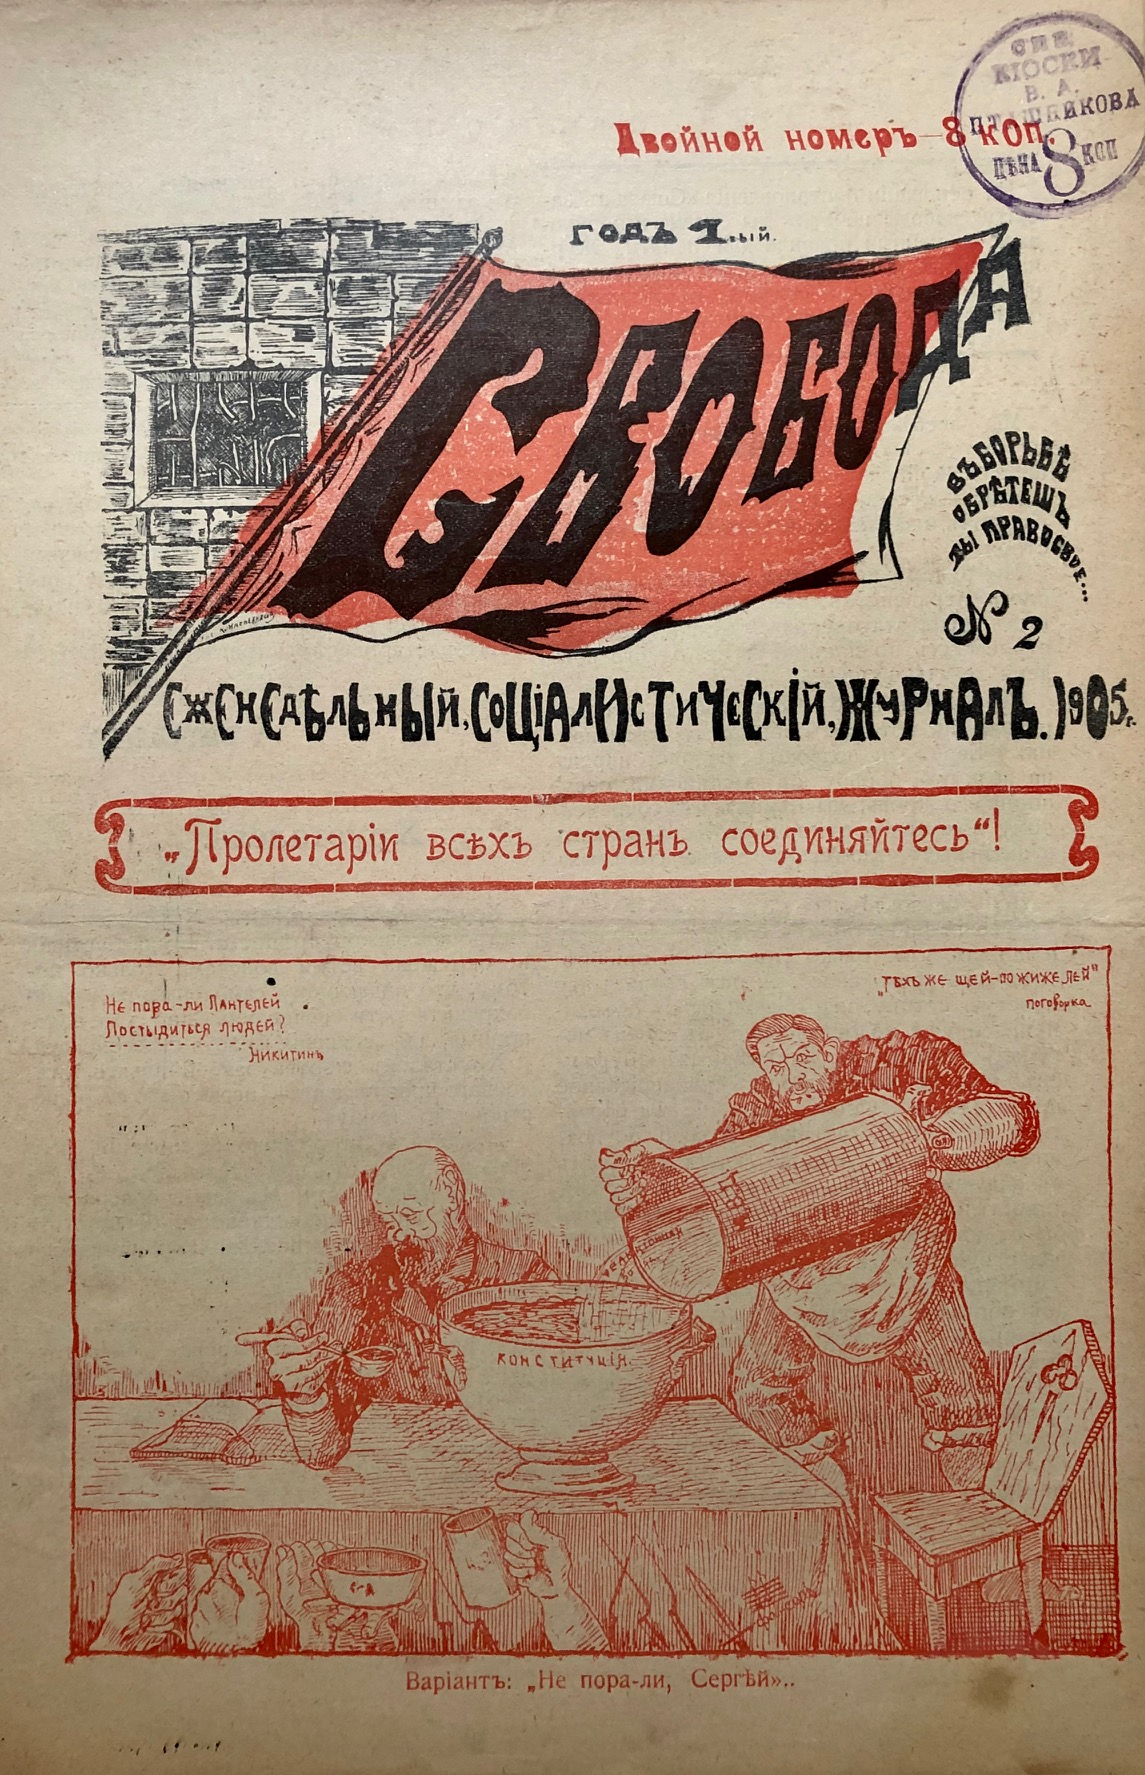 Lot 503 - La liberté. Свобода. 1905 г., №№ 1-2. Редактор С. Усас. [...]